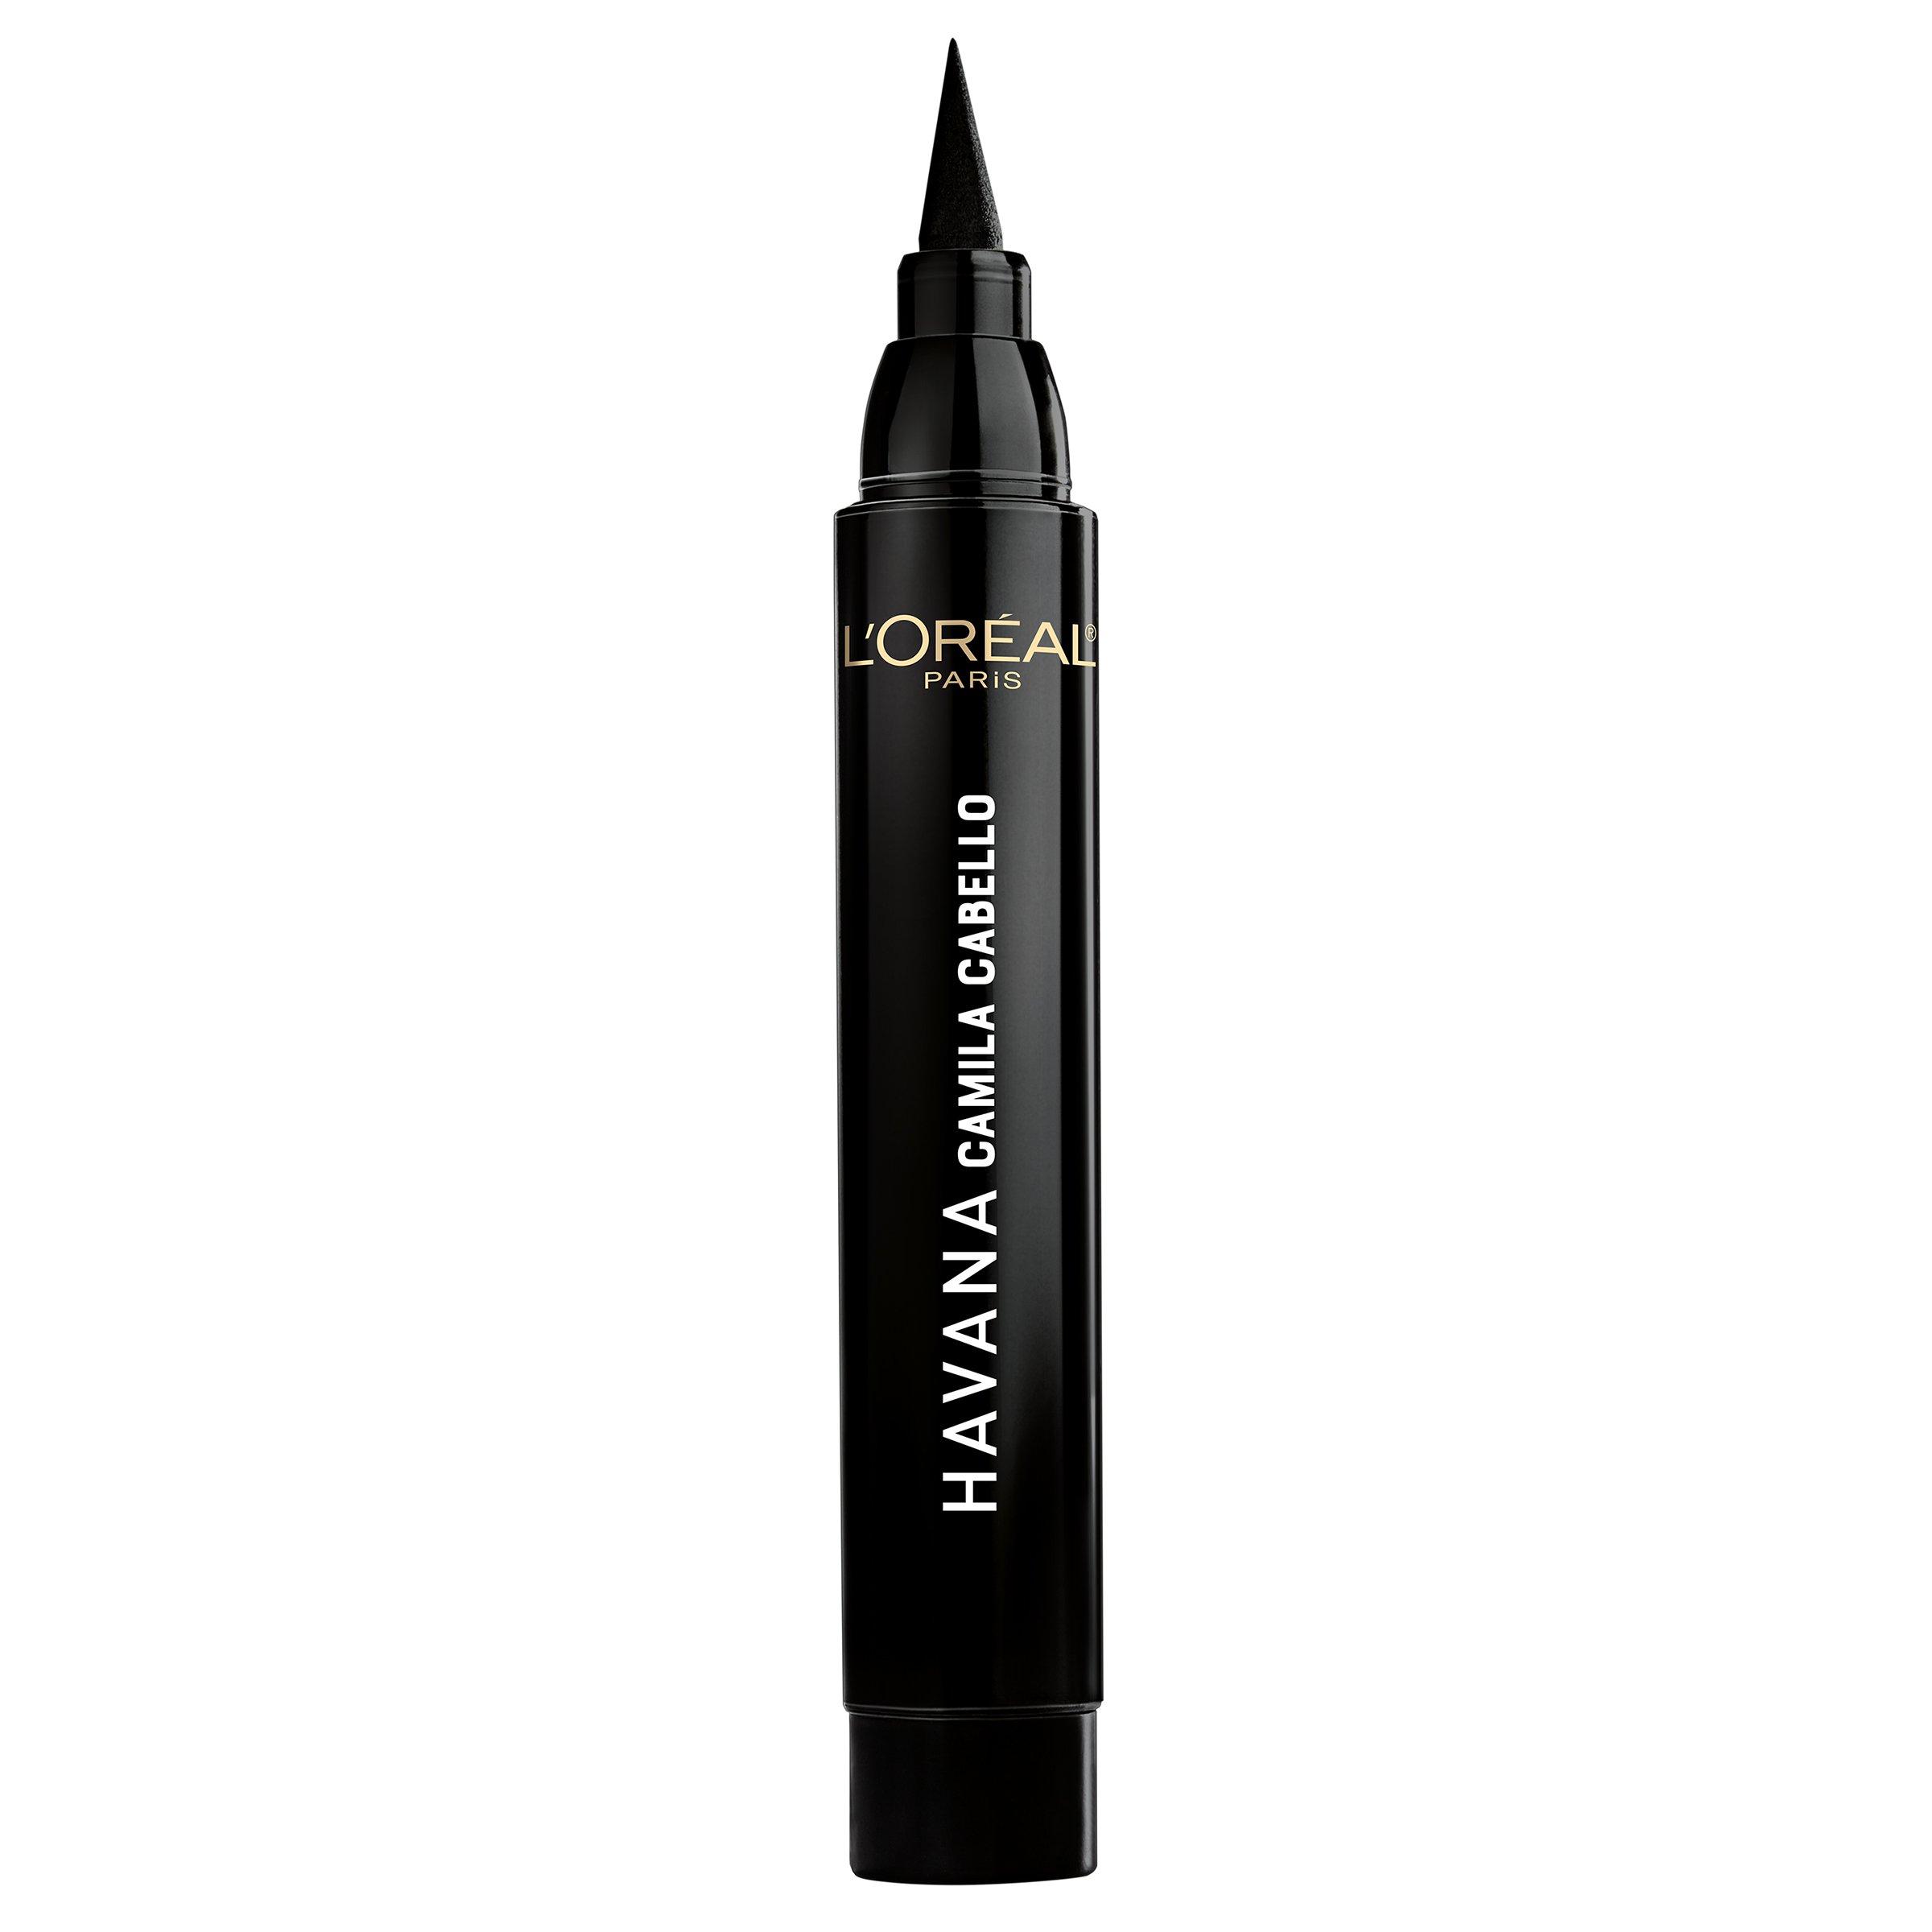 L'Oreal Paris Cosmetics X Camila Cabello Havana Flash Liner Liquid Eyeliner, Black, 0.08 Fluid Ounce